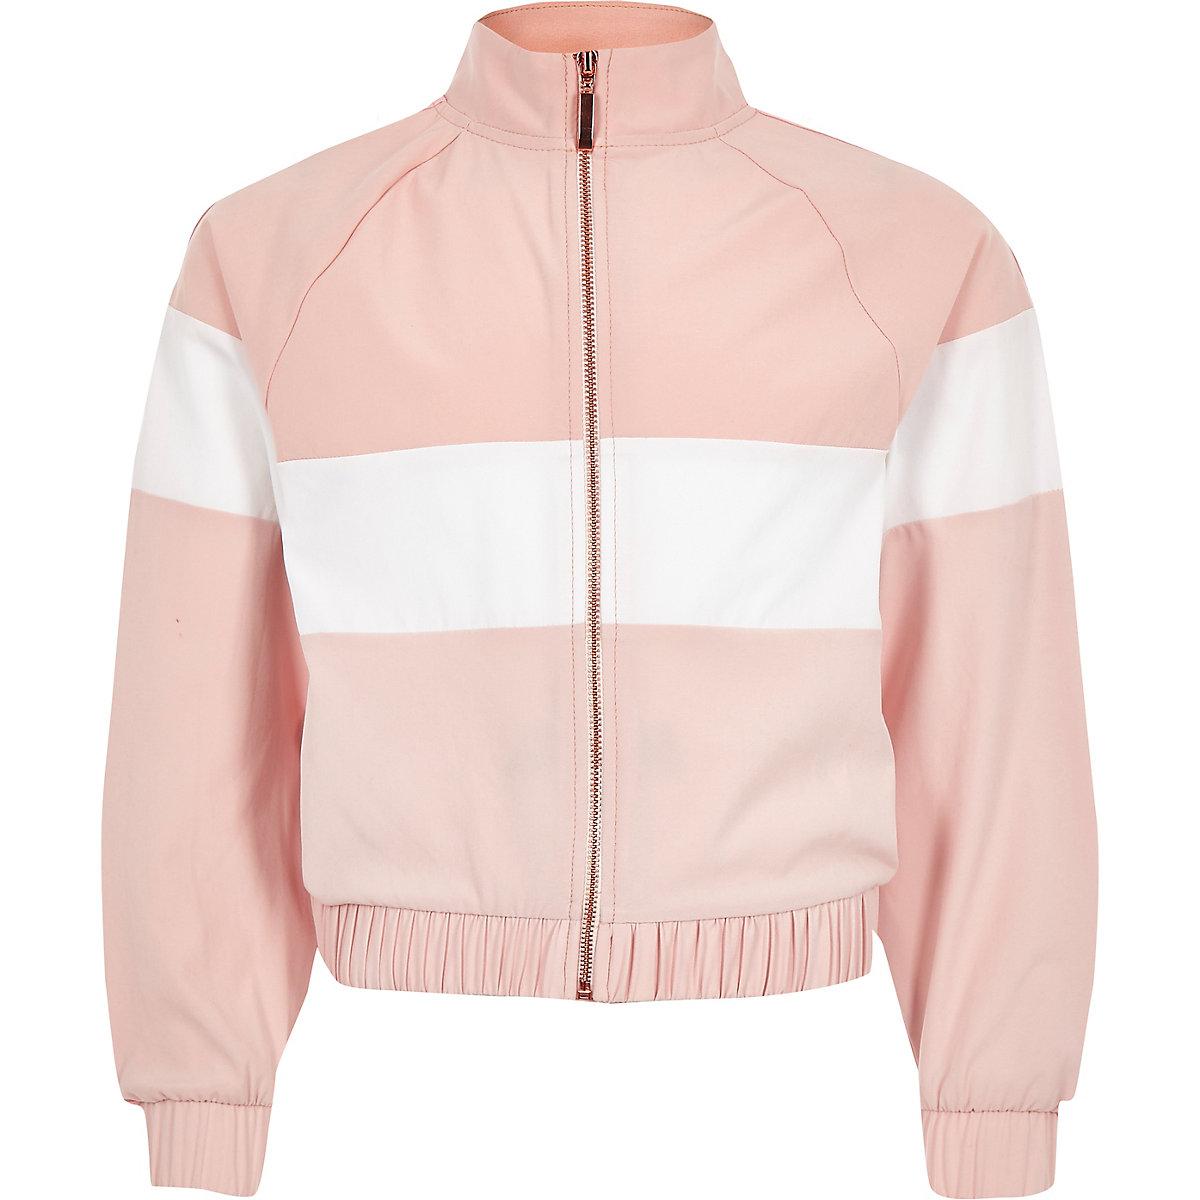 Girls RI Active pink block track jacket